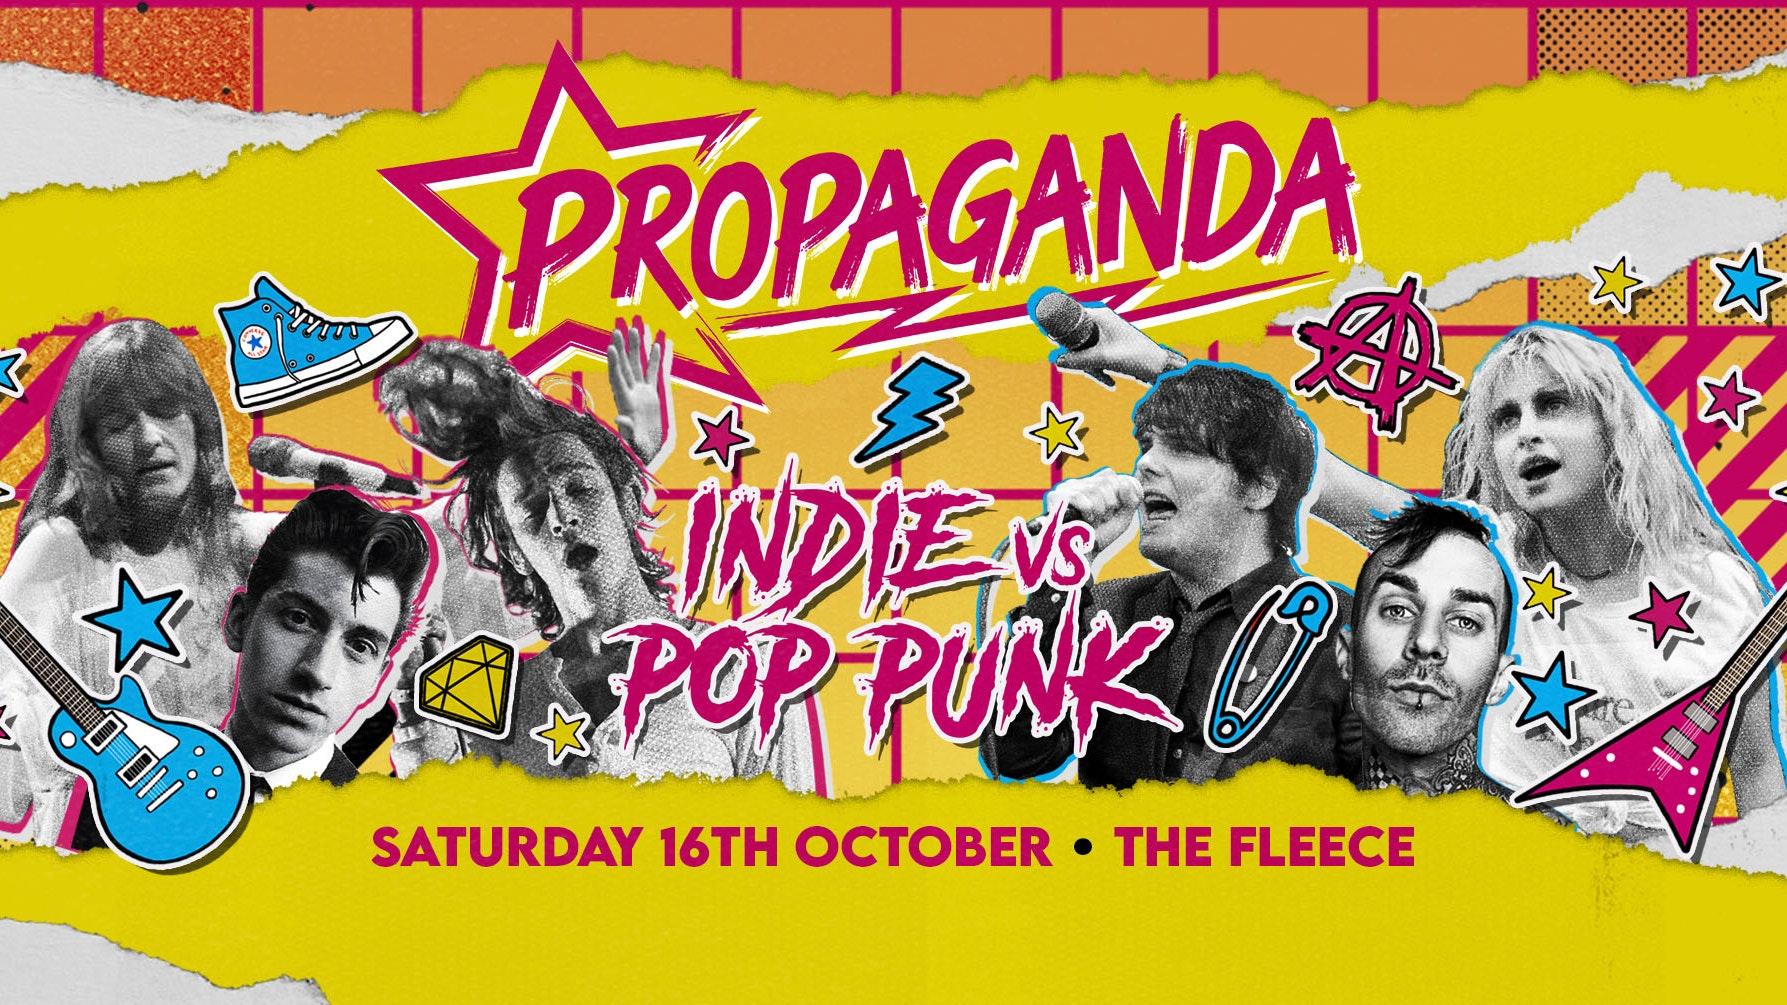 Propaganda Bristol – Indie vs Pop-Punk!